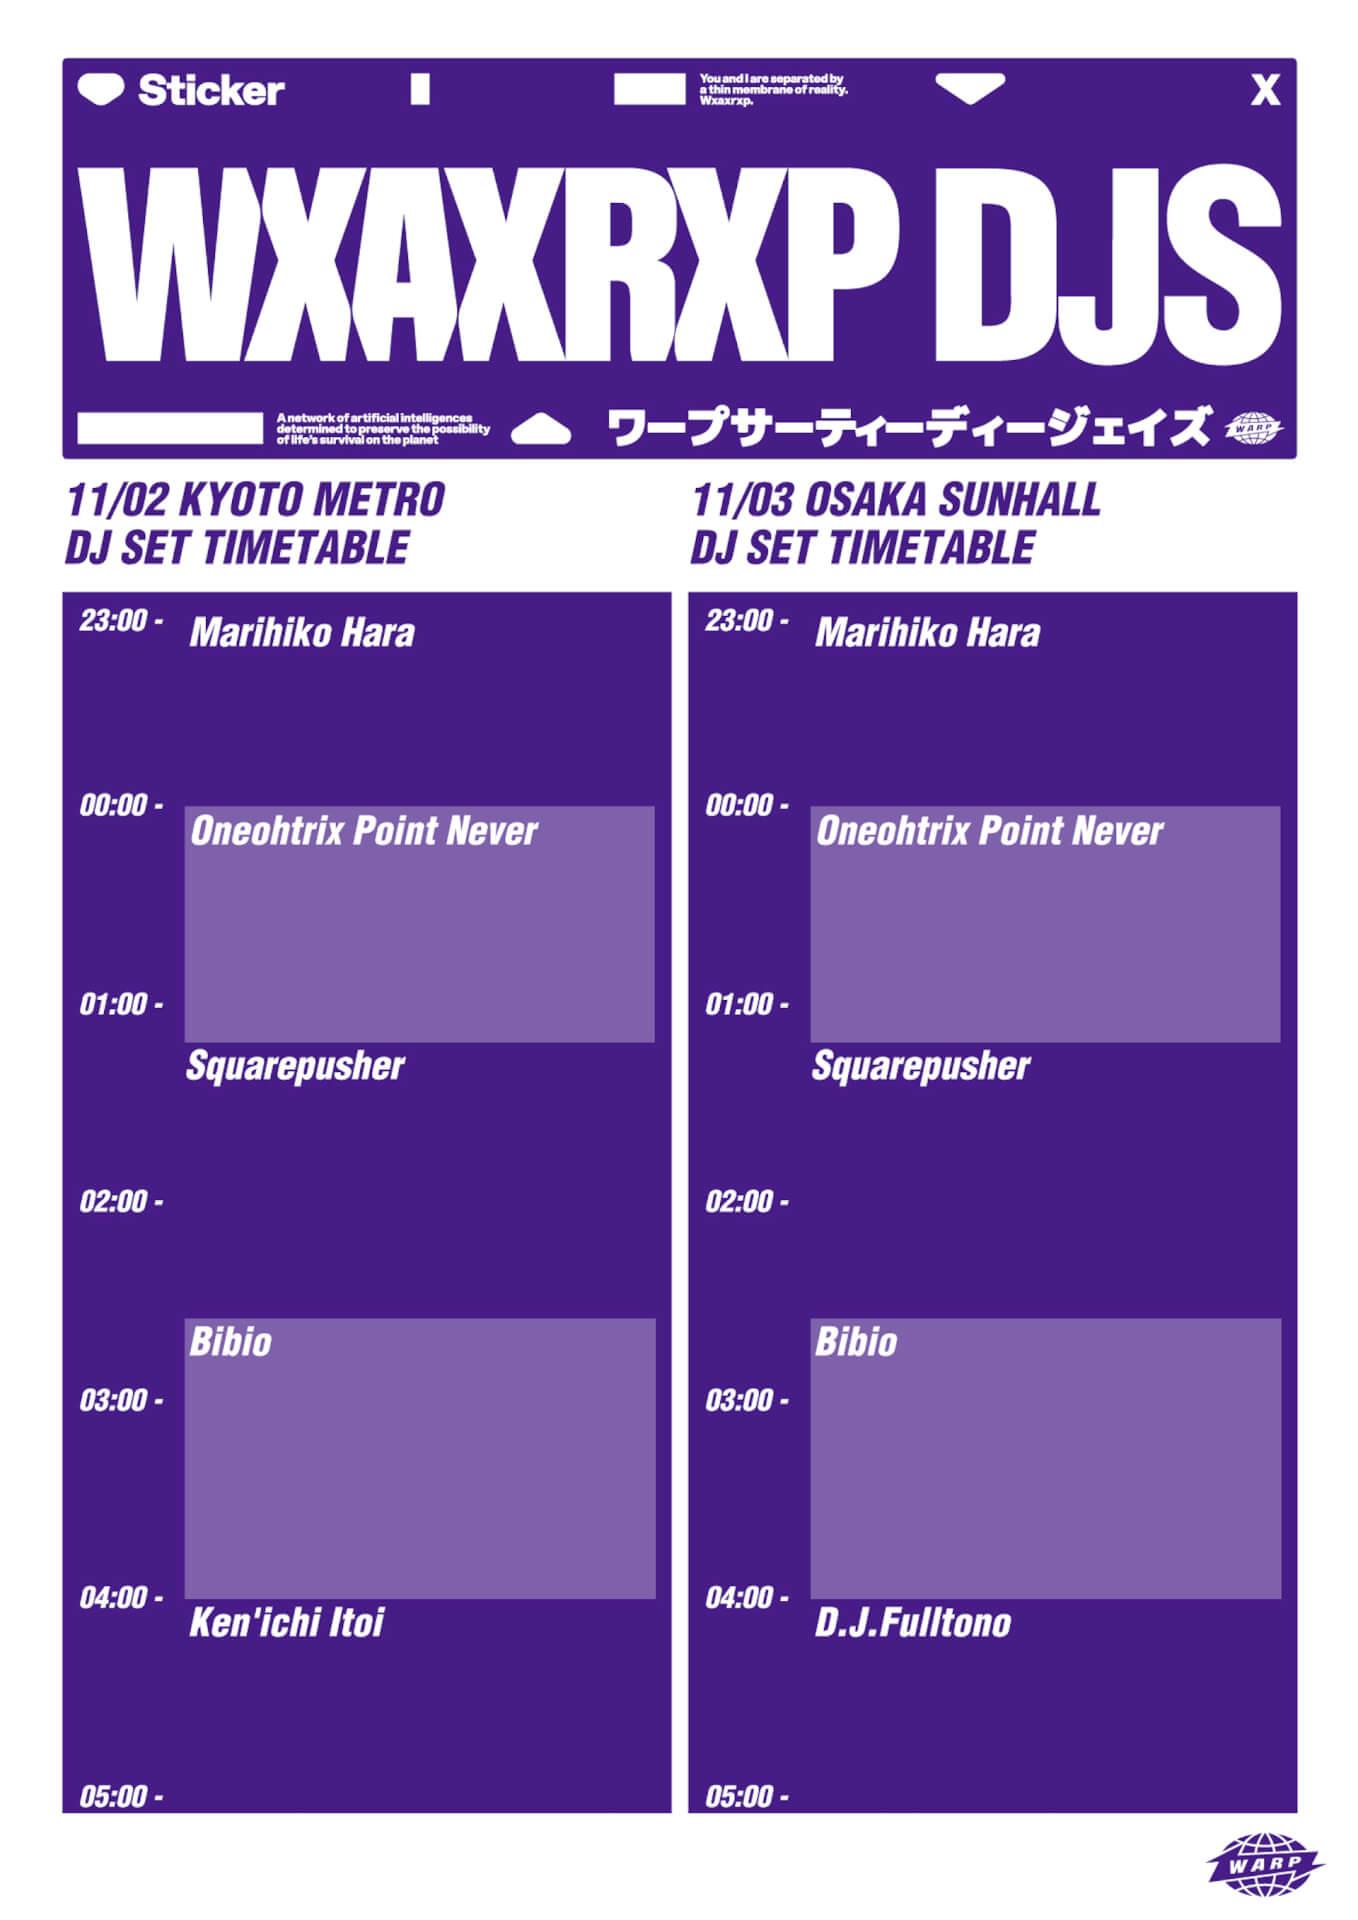 〈WARP RECORDS〉30周年スペシャル・パーティー<WXAXRXP DJS>の全アクトが発表!東京に真鍋大度、大阪・京都に原摩利彦が登場 WXAXAXP_timetable_kansai